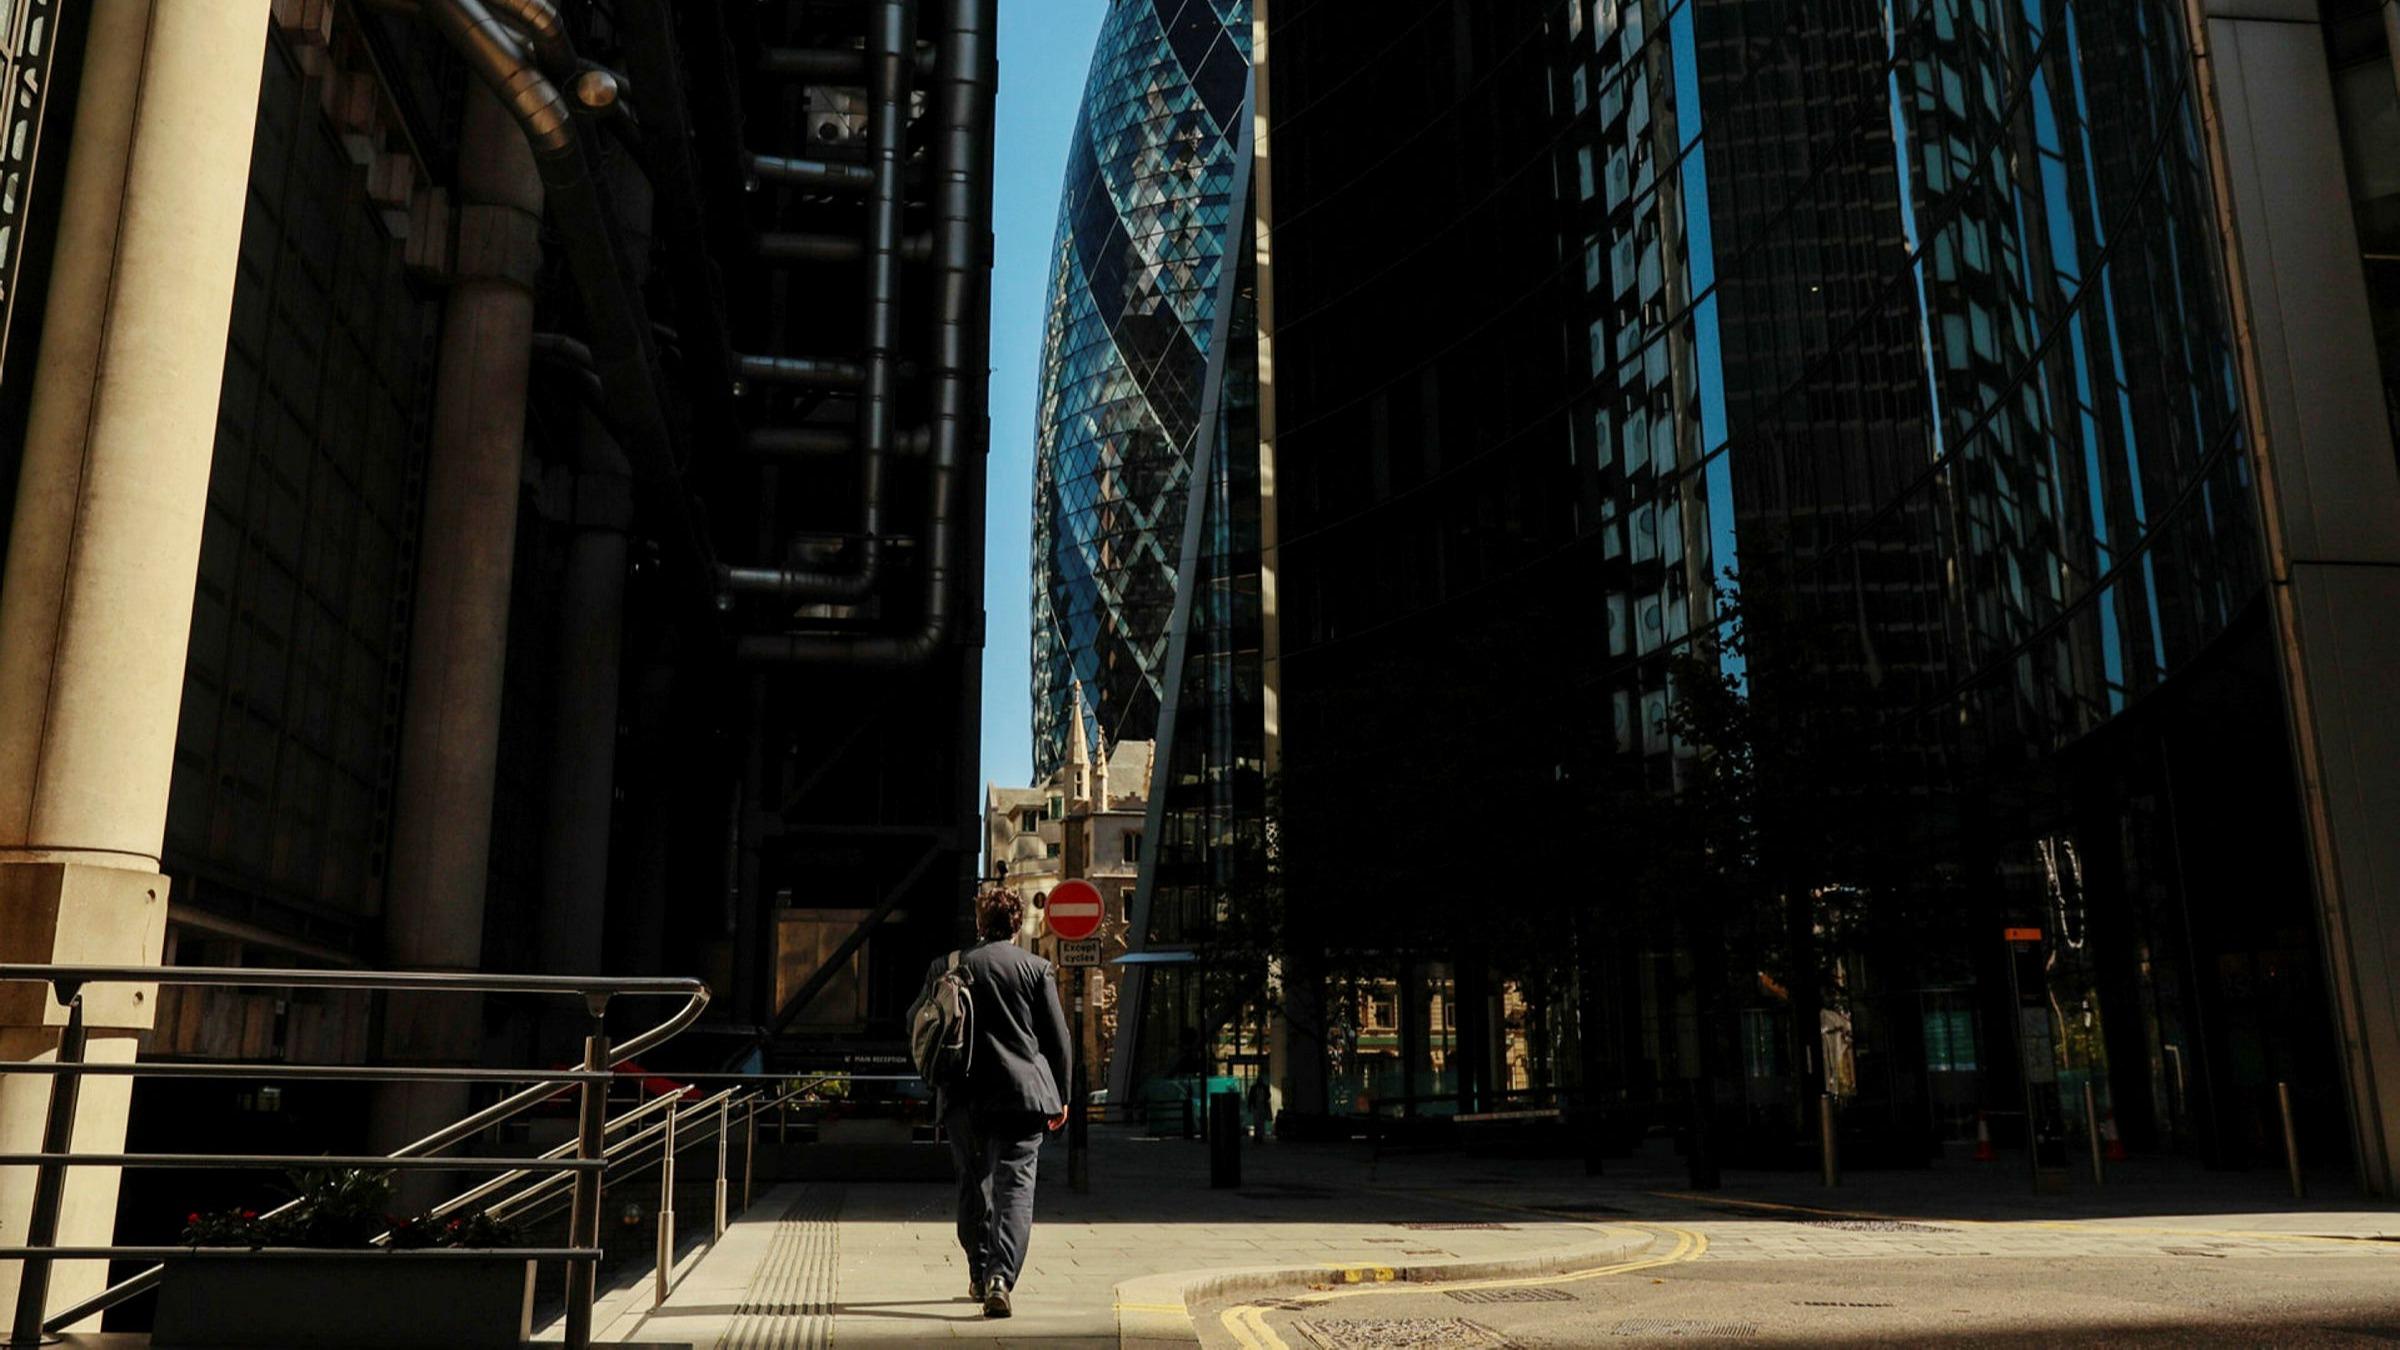 City of london investment trust google finance canada forex online trading job 965 guitars